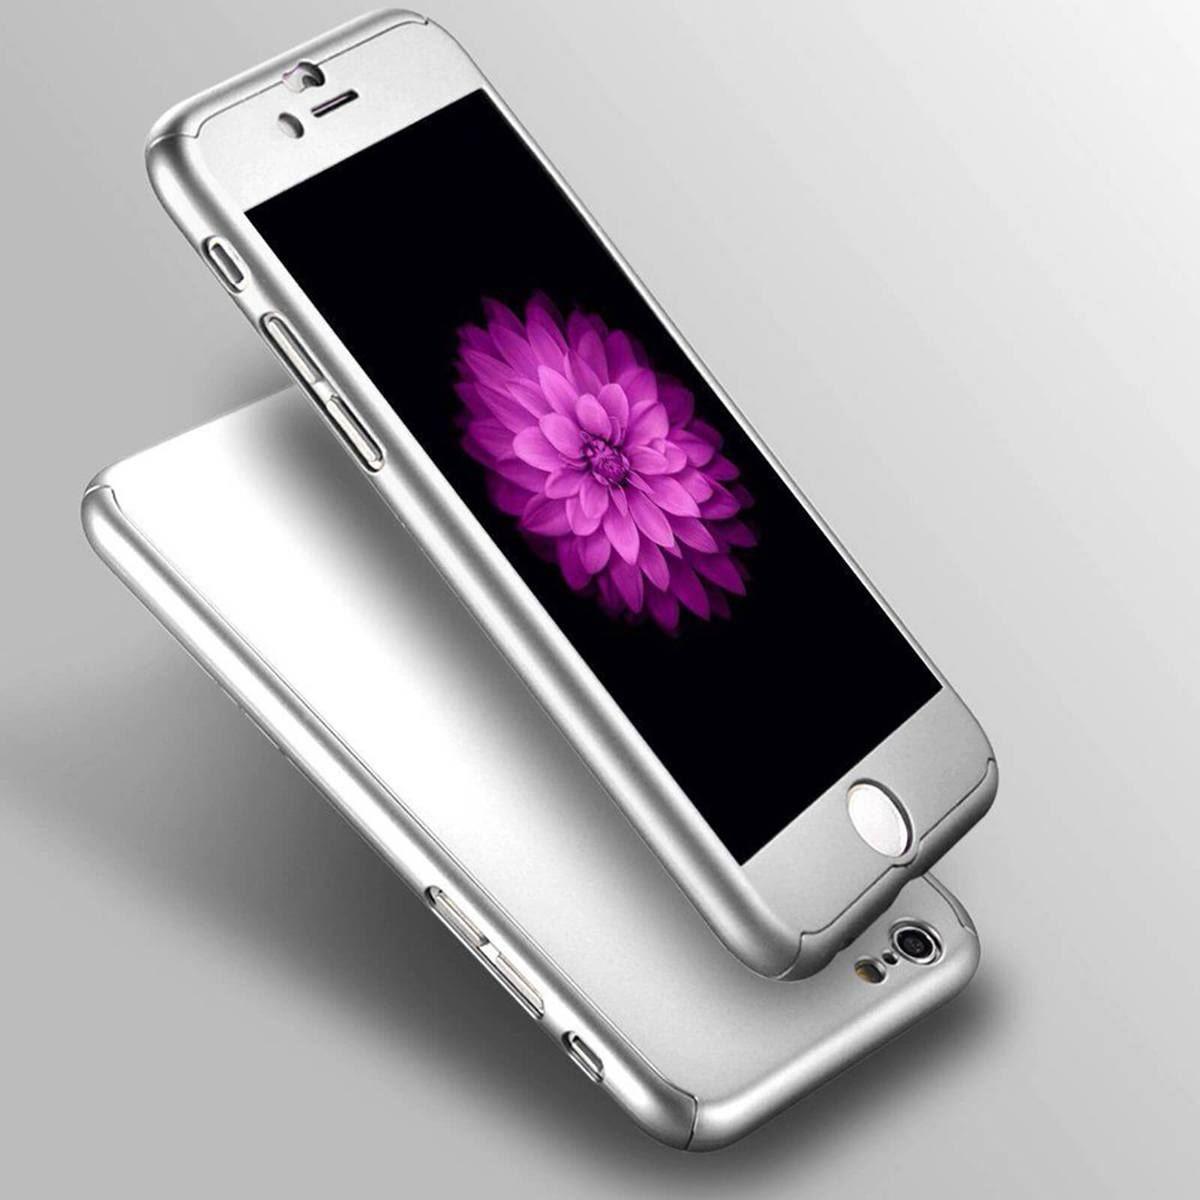 For-Apple-iPhone-XS-Max-XR-Hybrid-360-Slim-Ultra-Thin-Heavy-Duty-Shockproof-Case Indexbild 92